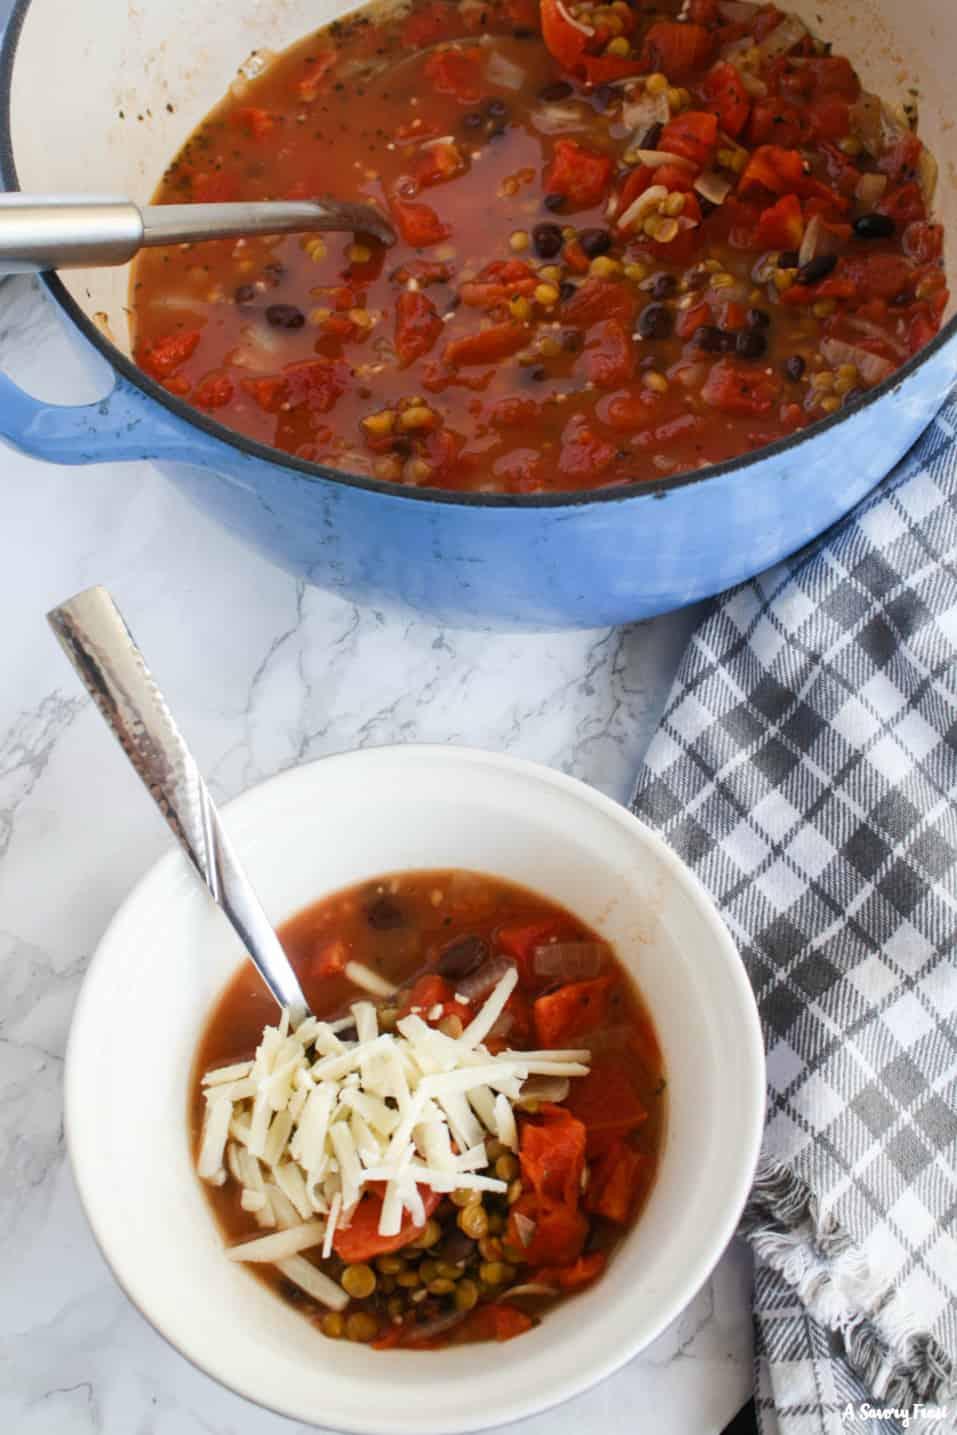 Recipe for Tomato Lentil Soup